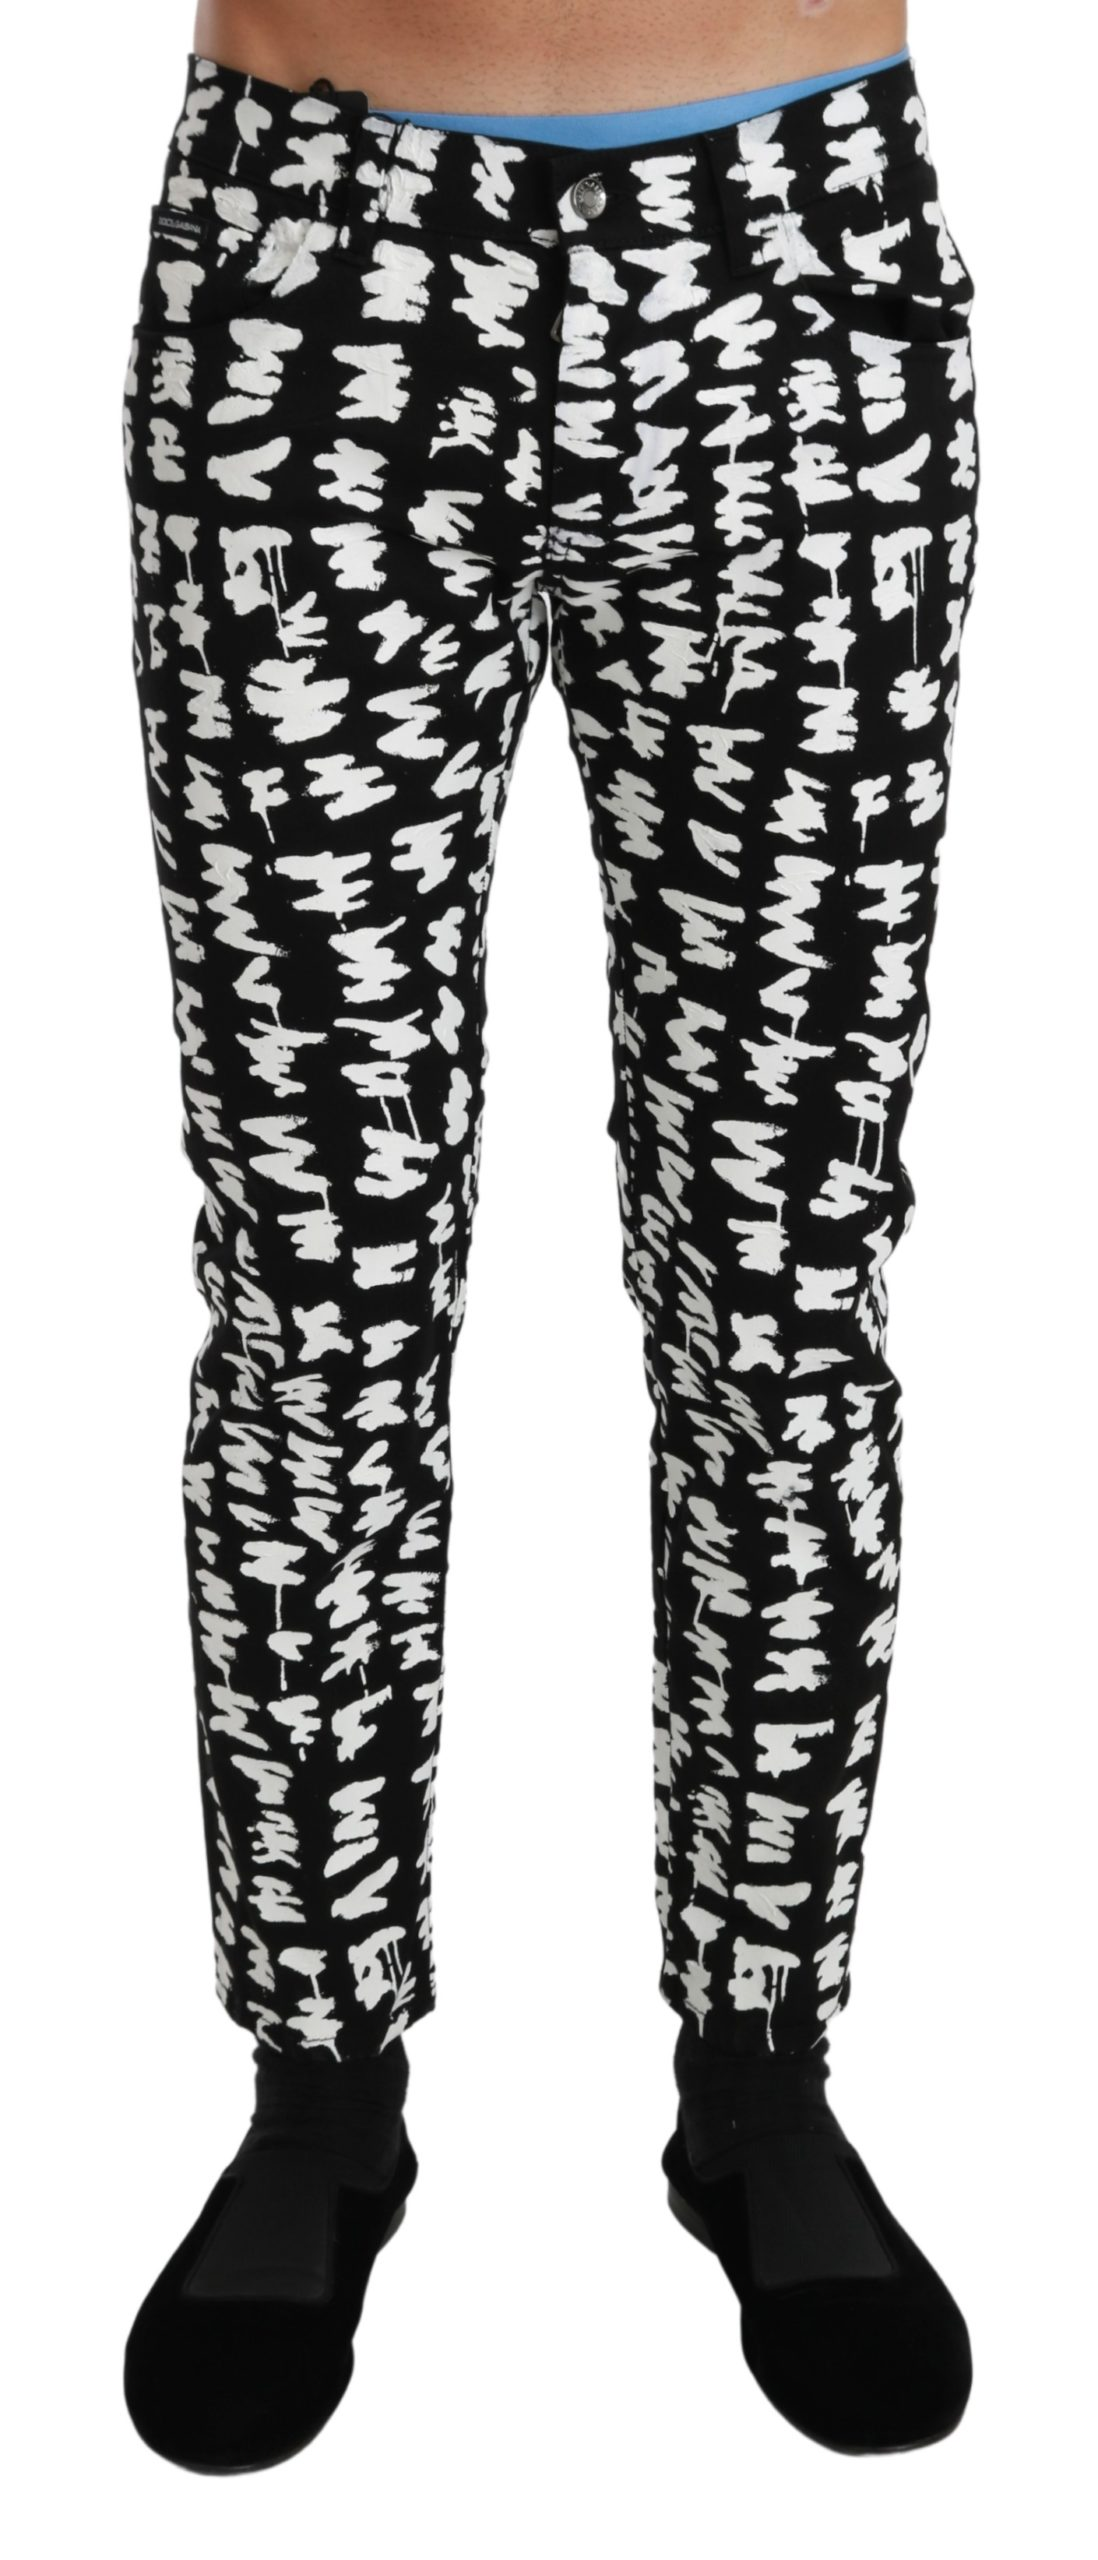 Dolce & Gabbana Men's Cotton Stretch CLASSIC Jeans Black PAN71037 - IT44   XS